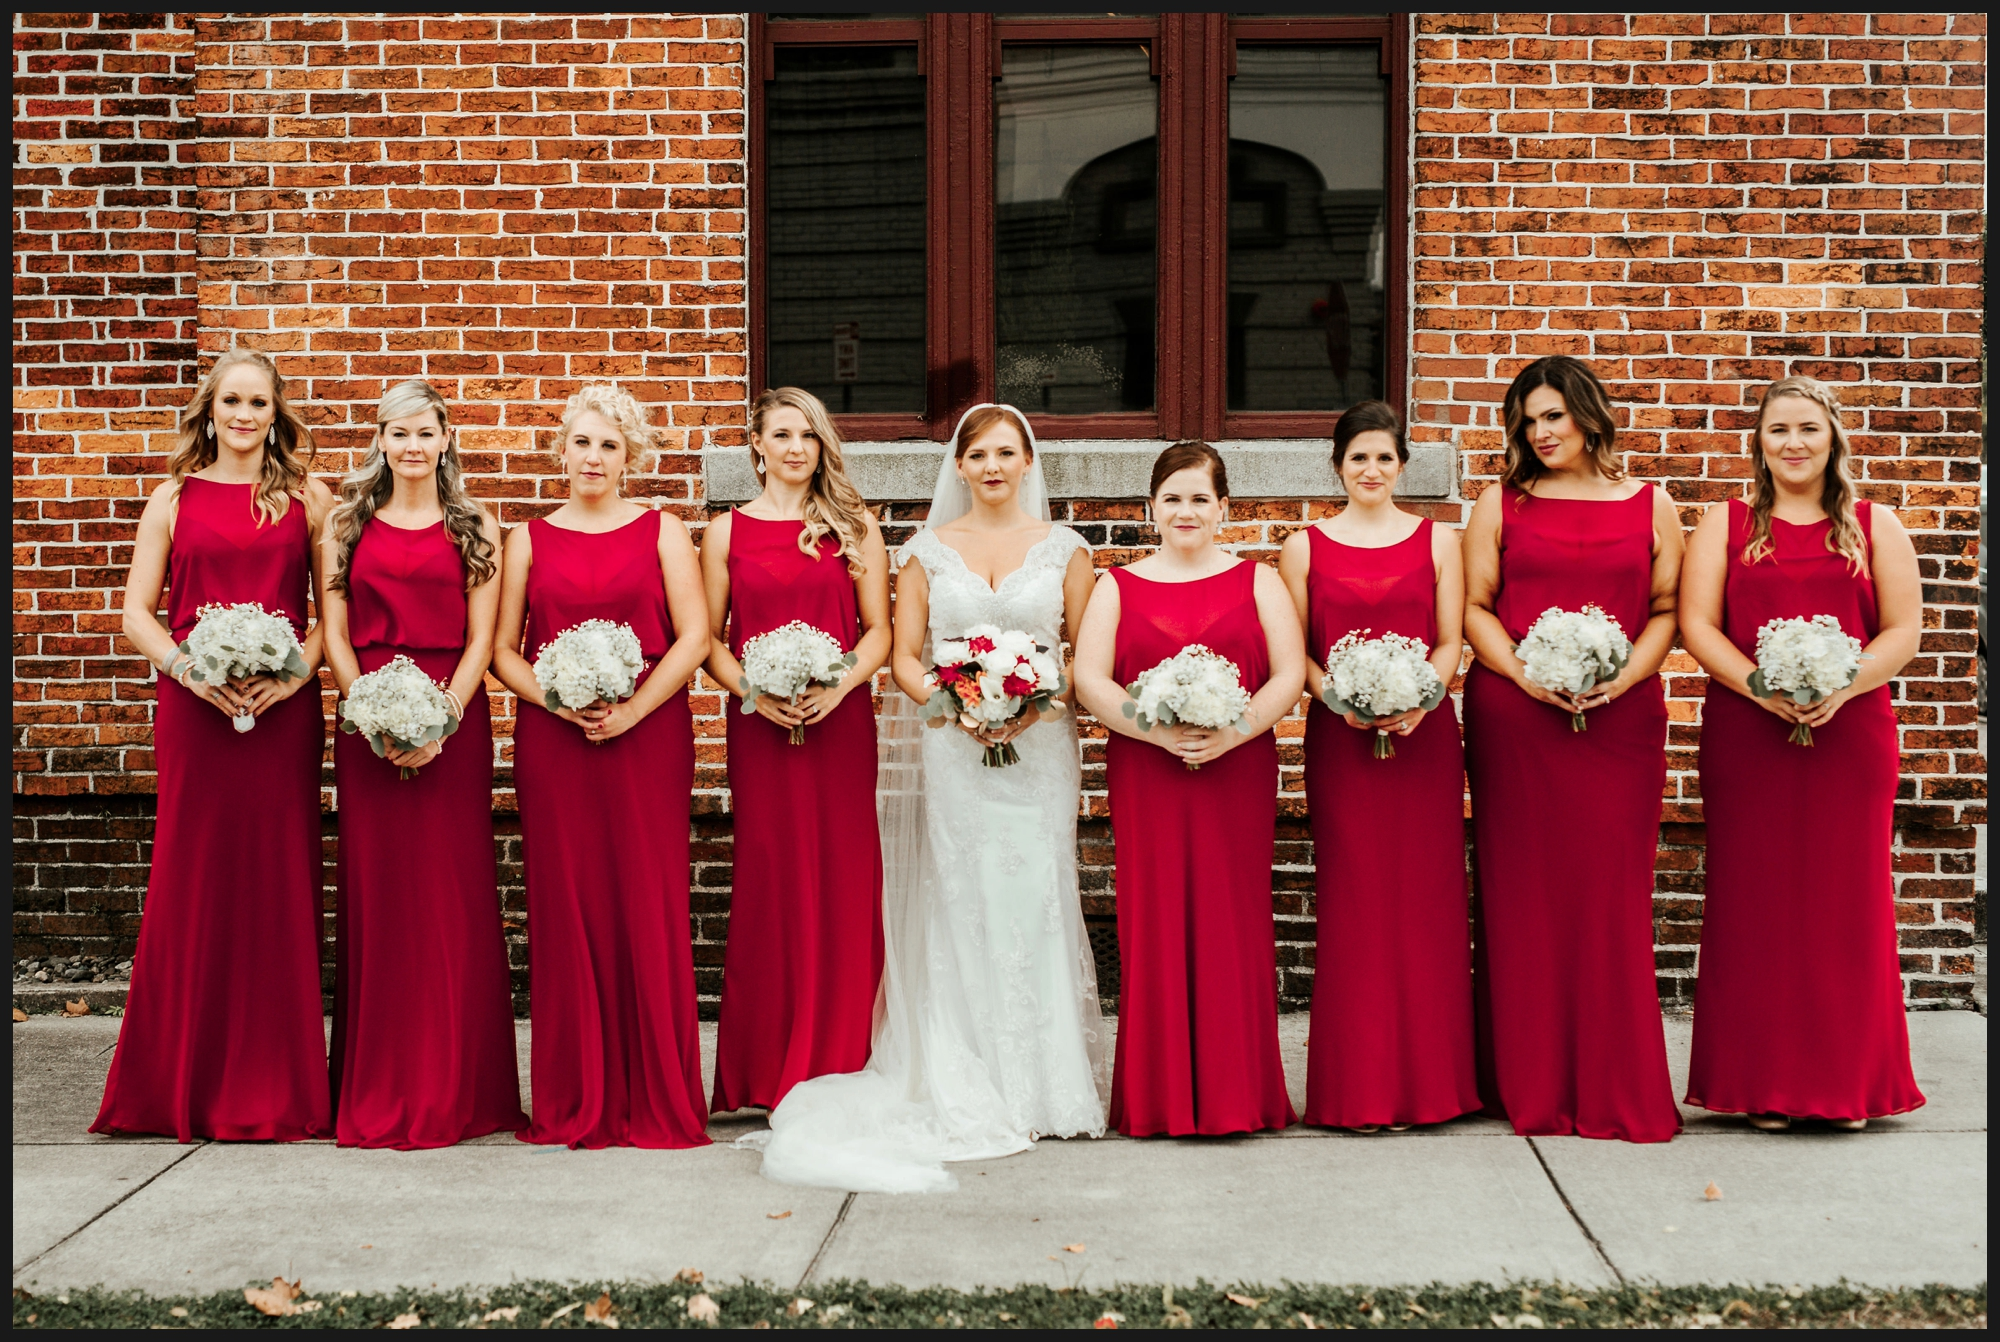 Orlando-Wedding-Photographer-destination-wedding-photographer-florida-wedding-photographer-bohemian-wedding-photographer_0609.jpg